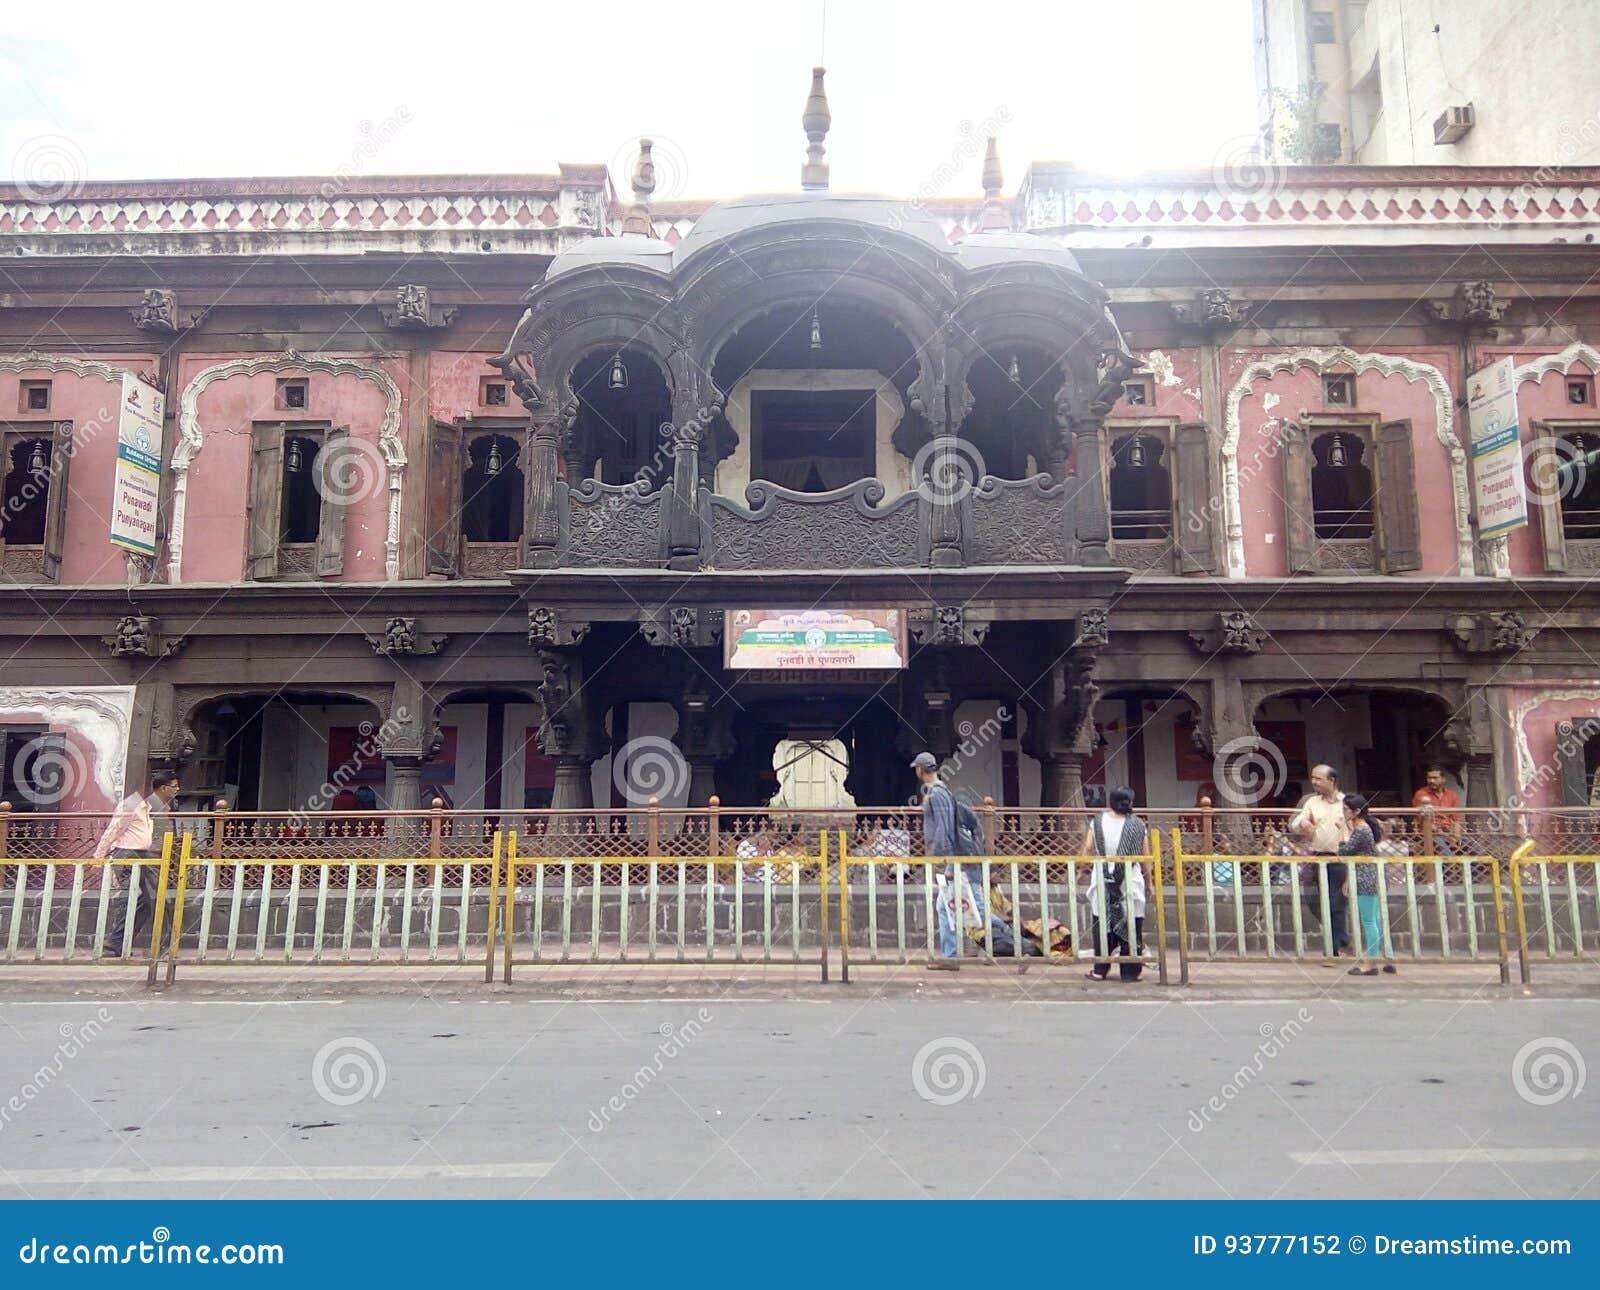 Vishrambagh Wada